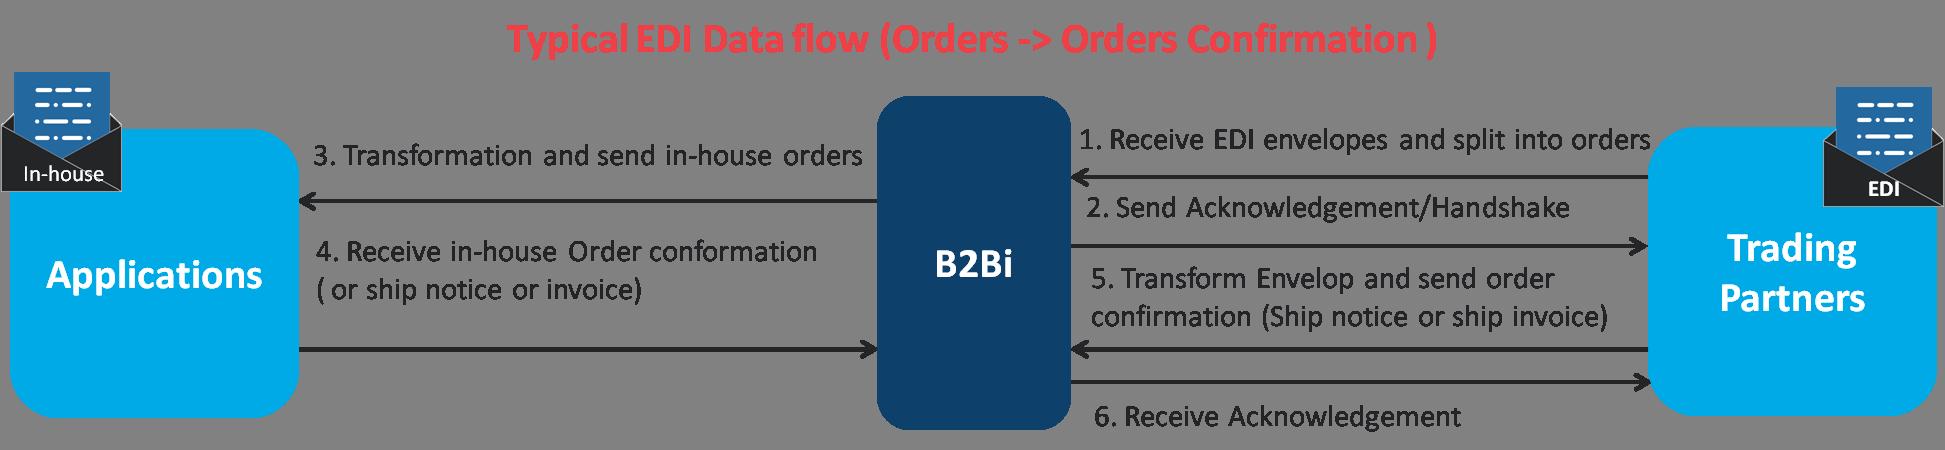 B2BI Typical EDI Data flow